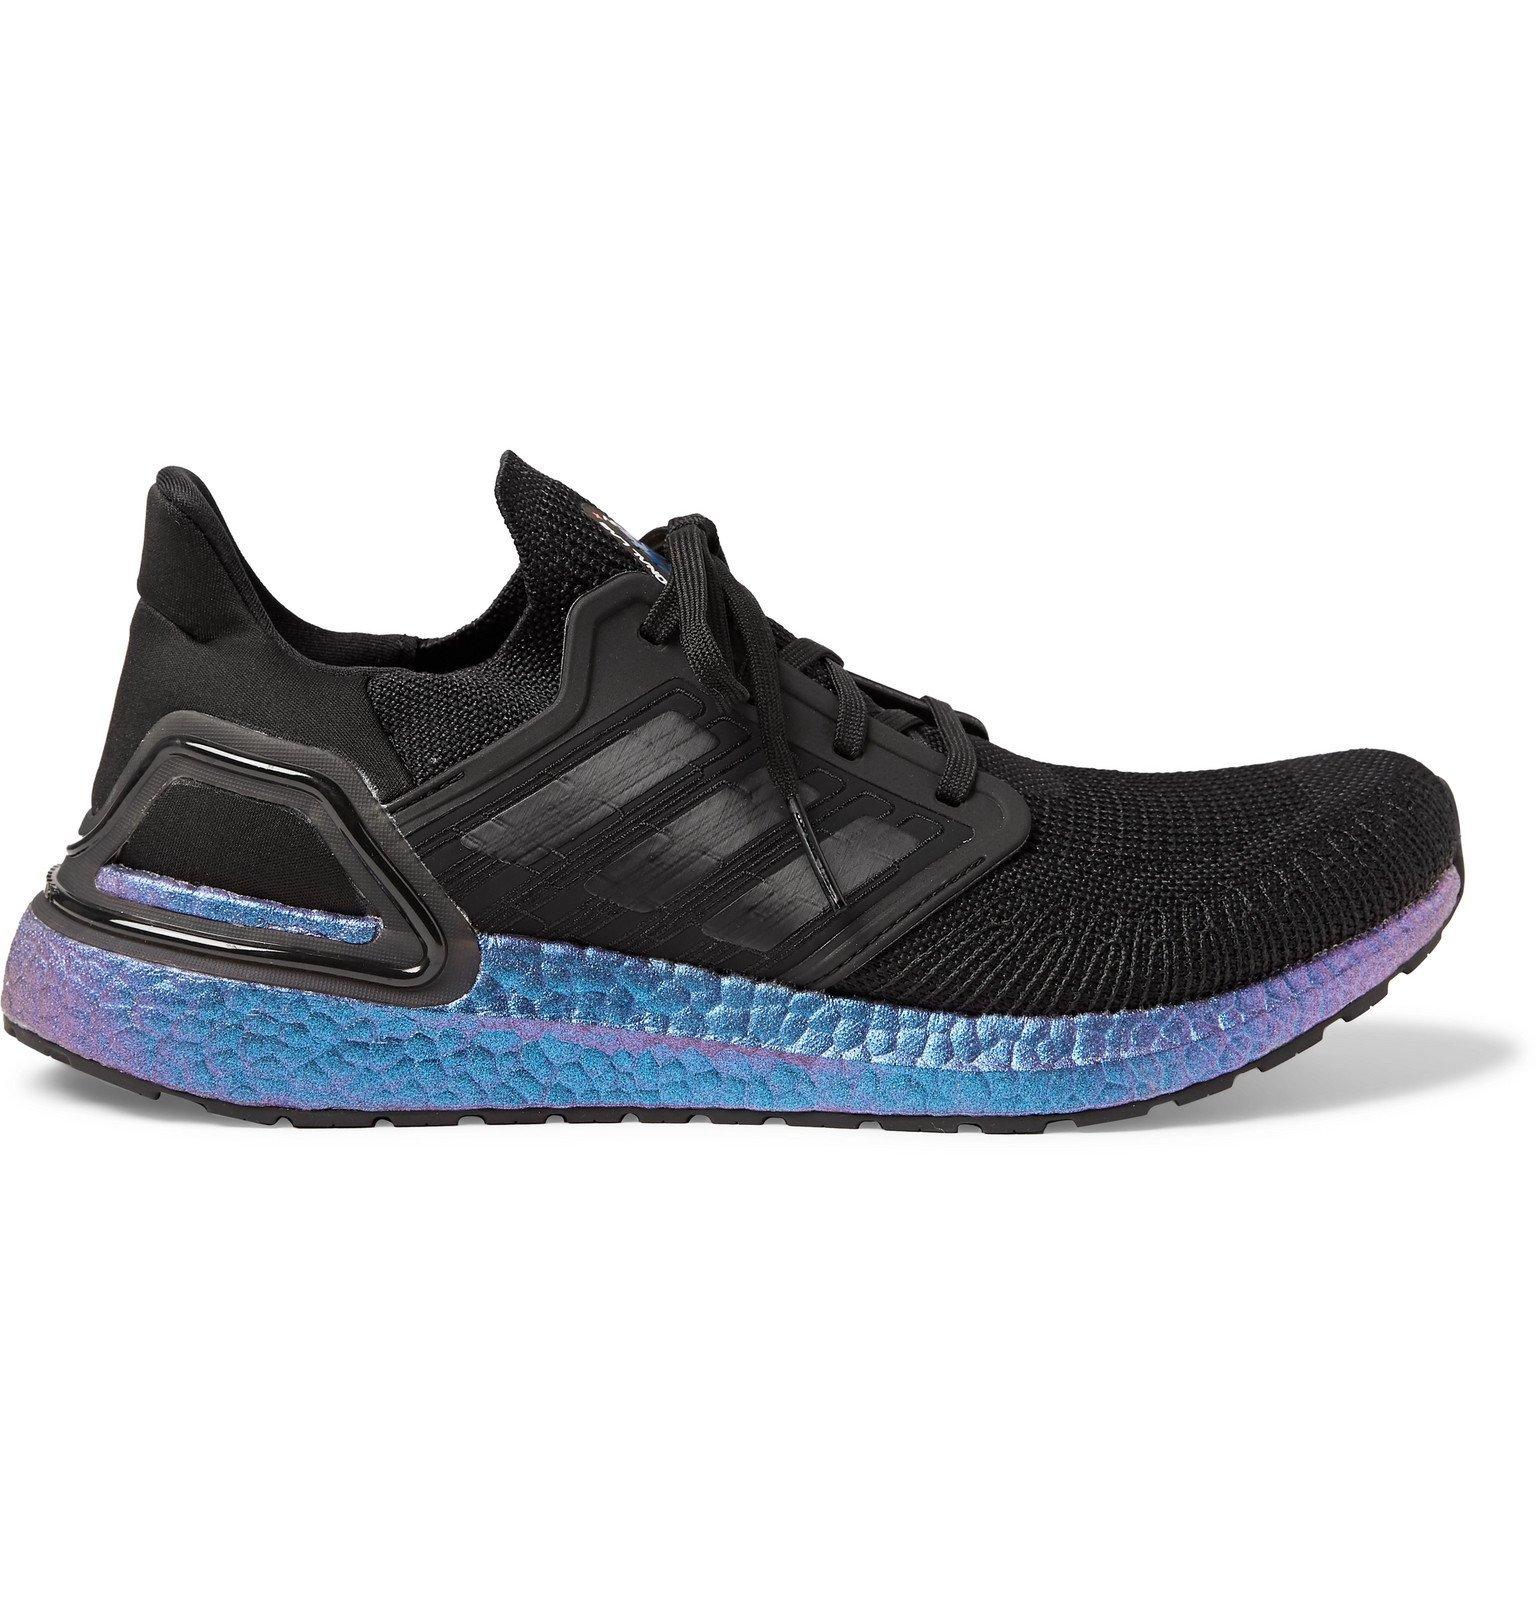 Photo: Adidas Sport - ISS National Lab UltraBOOST 20 Primeknit Running Sneakers - Black